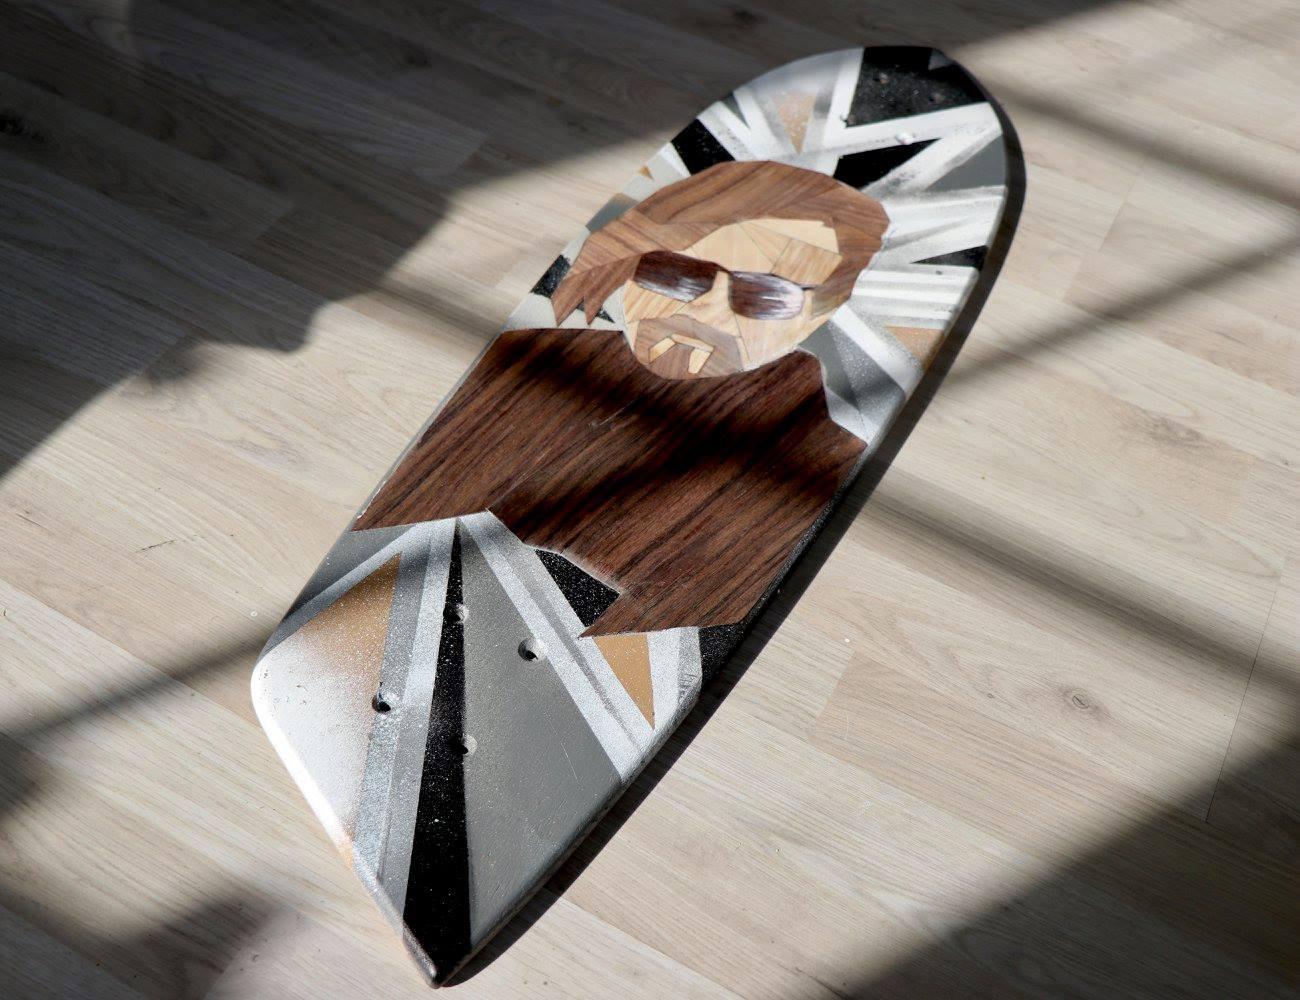 eveno-pinto-chalk-long-days-longboards-01